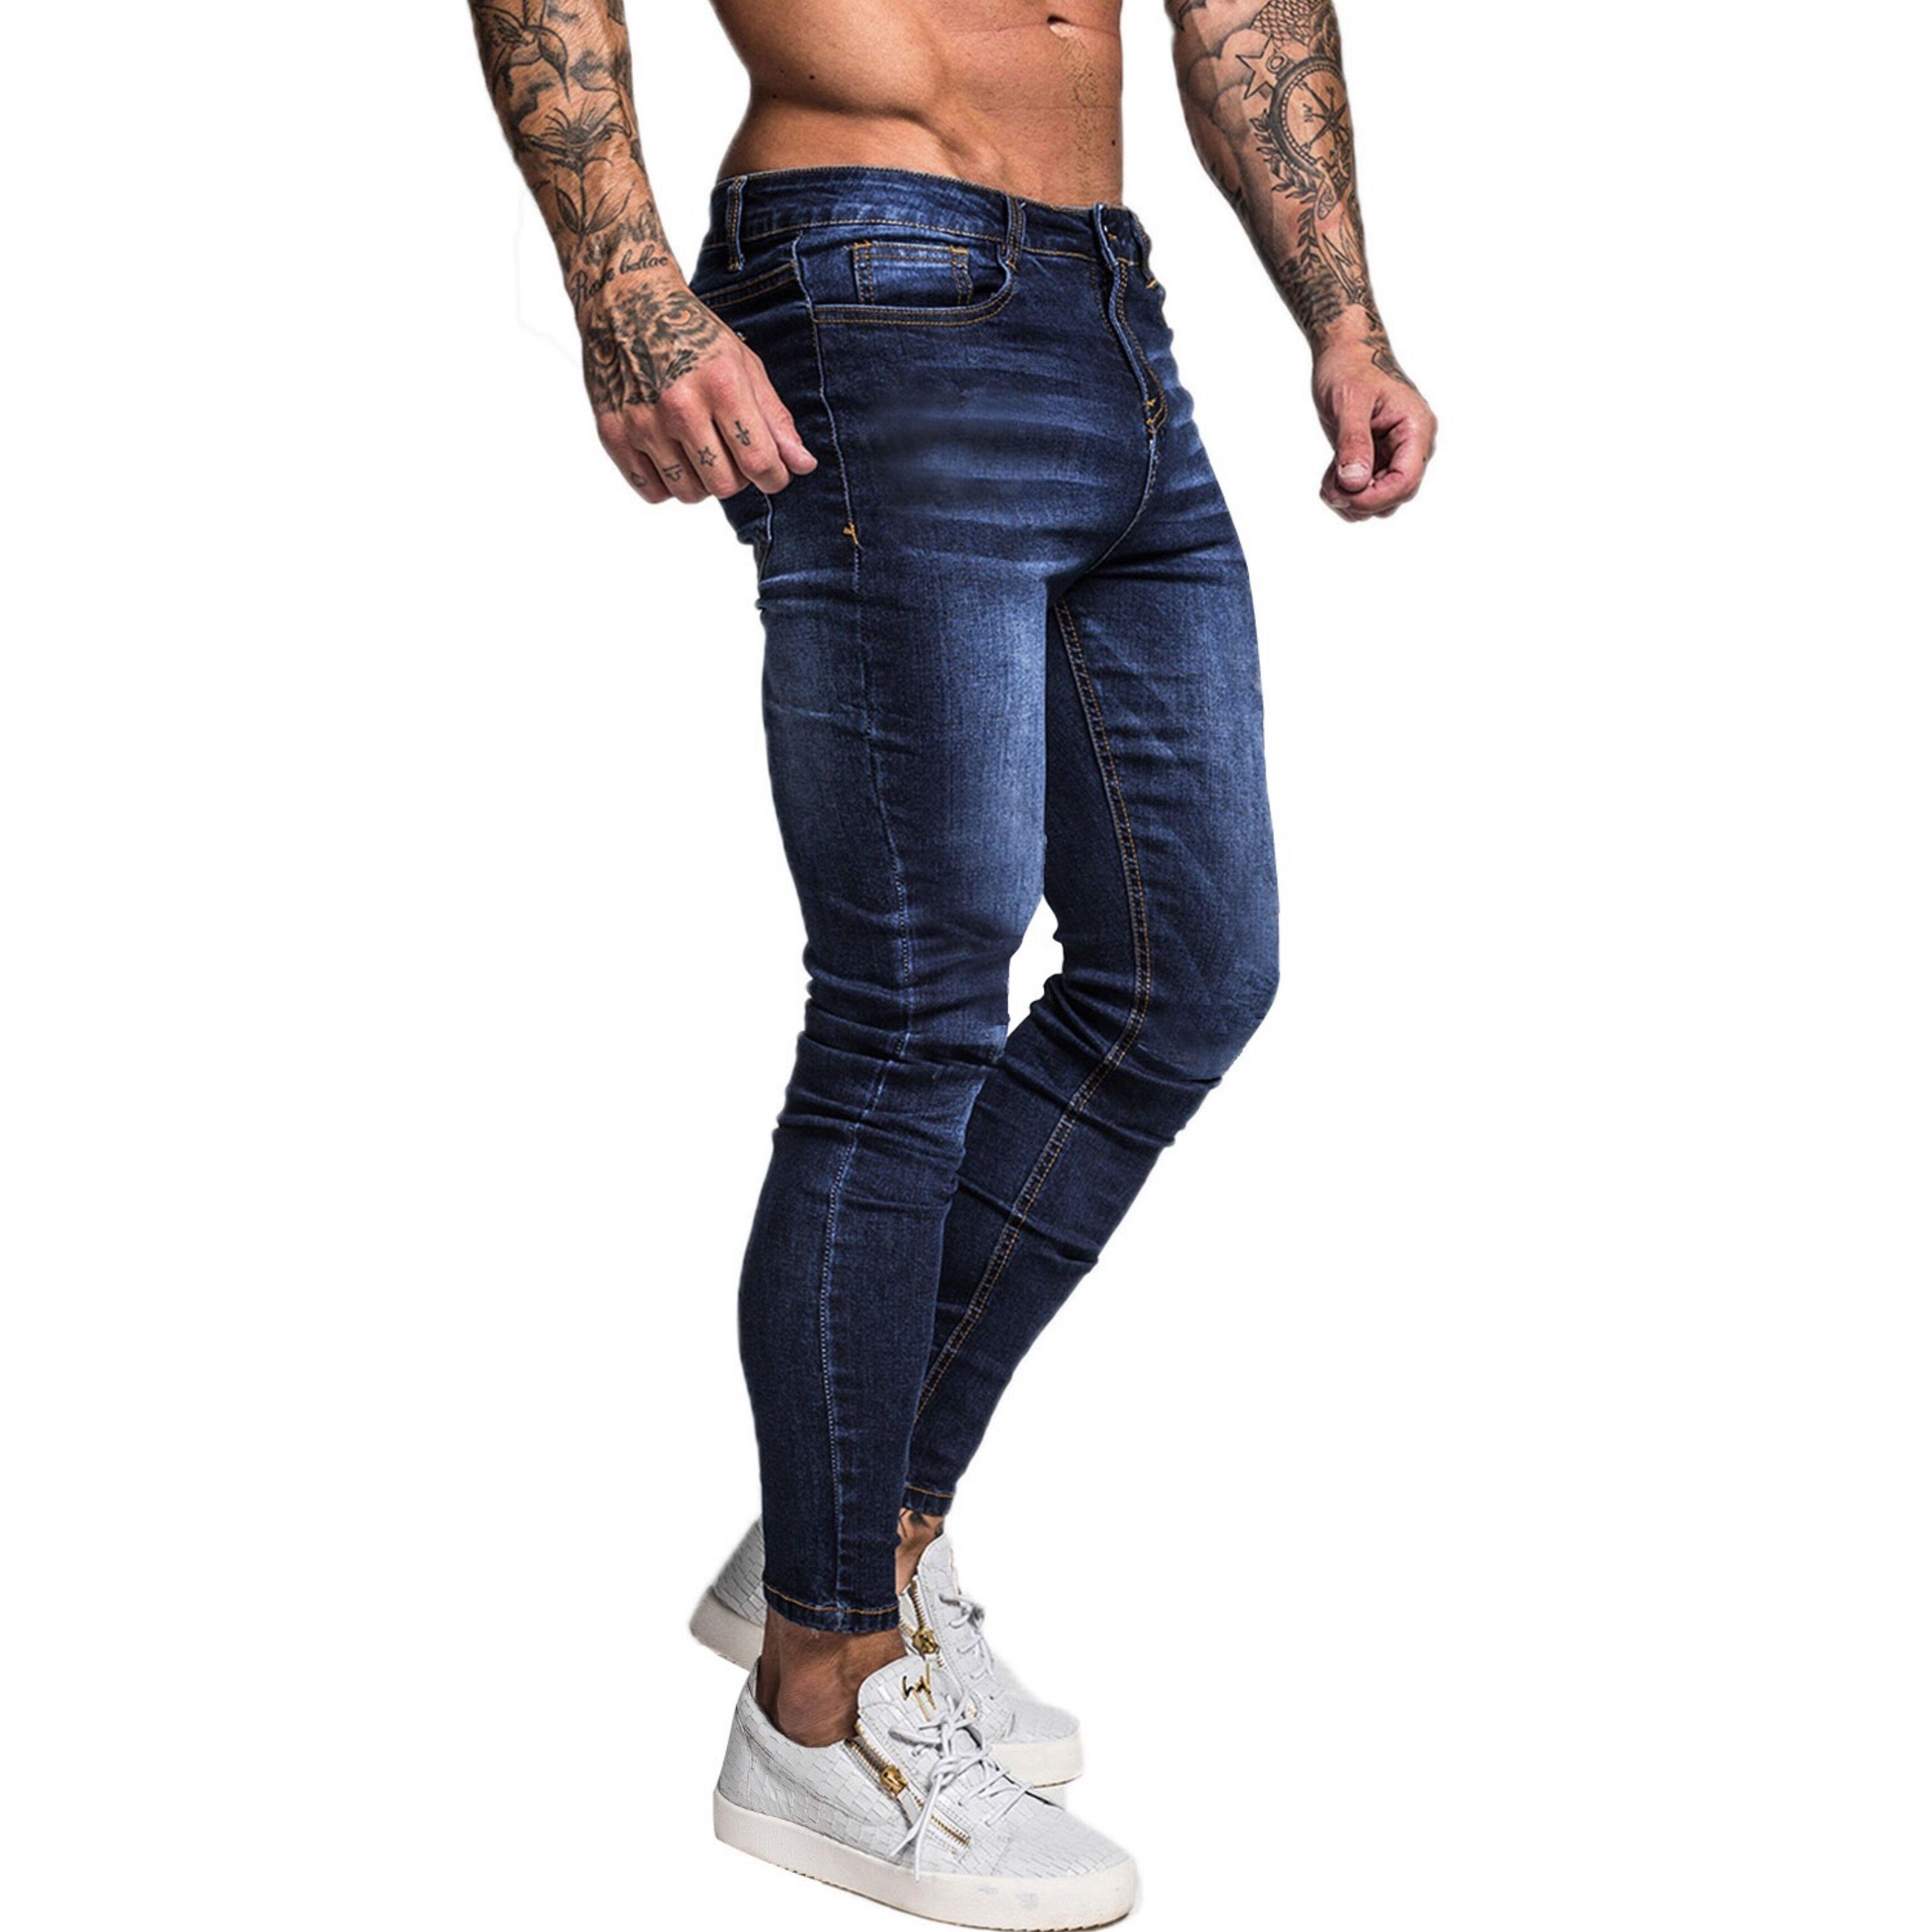 GINGTTO Blue Brand Jeans Men Slim Fit Super Skinny Jeans For Men Hip Hop Street Wear Skinny Leg Fashion Stretch Pants Zm121